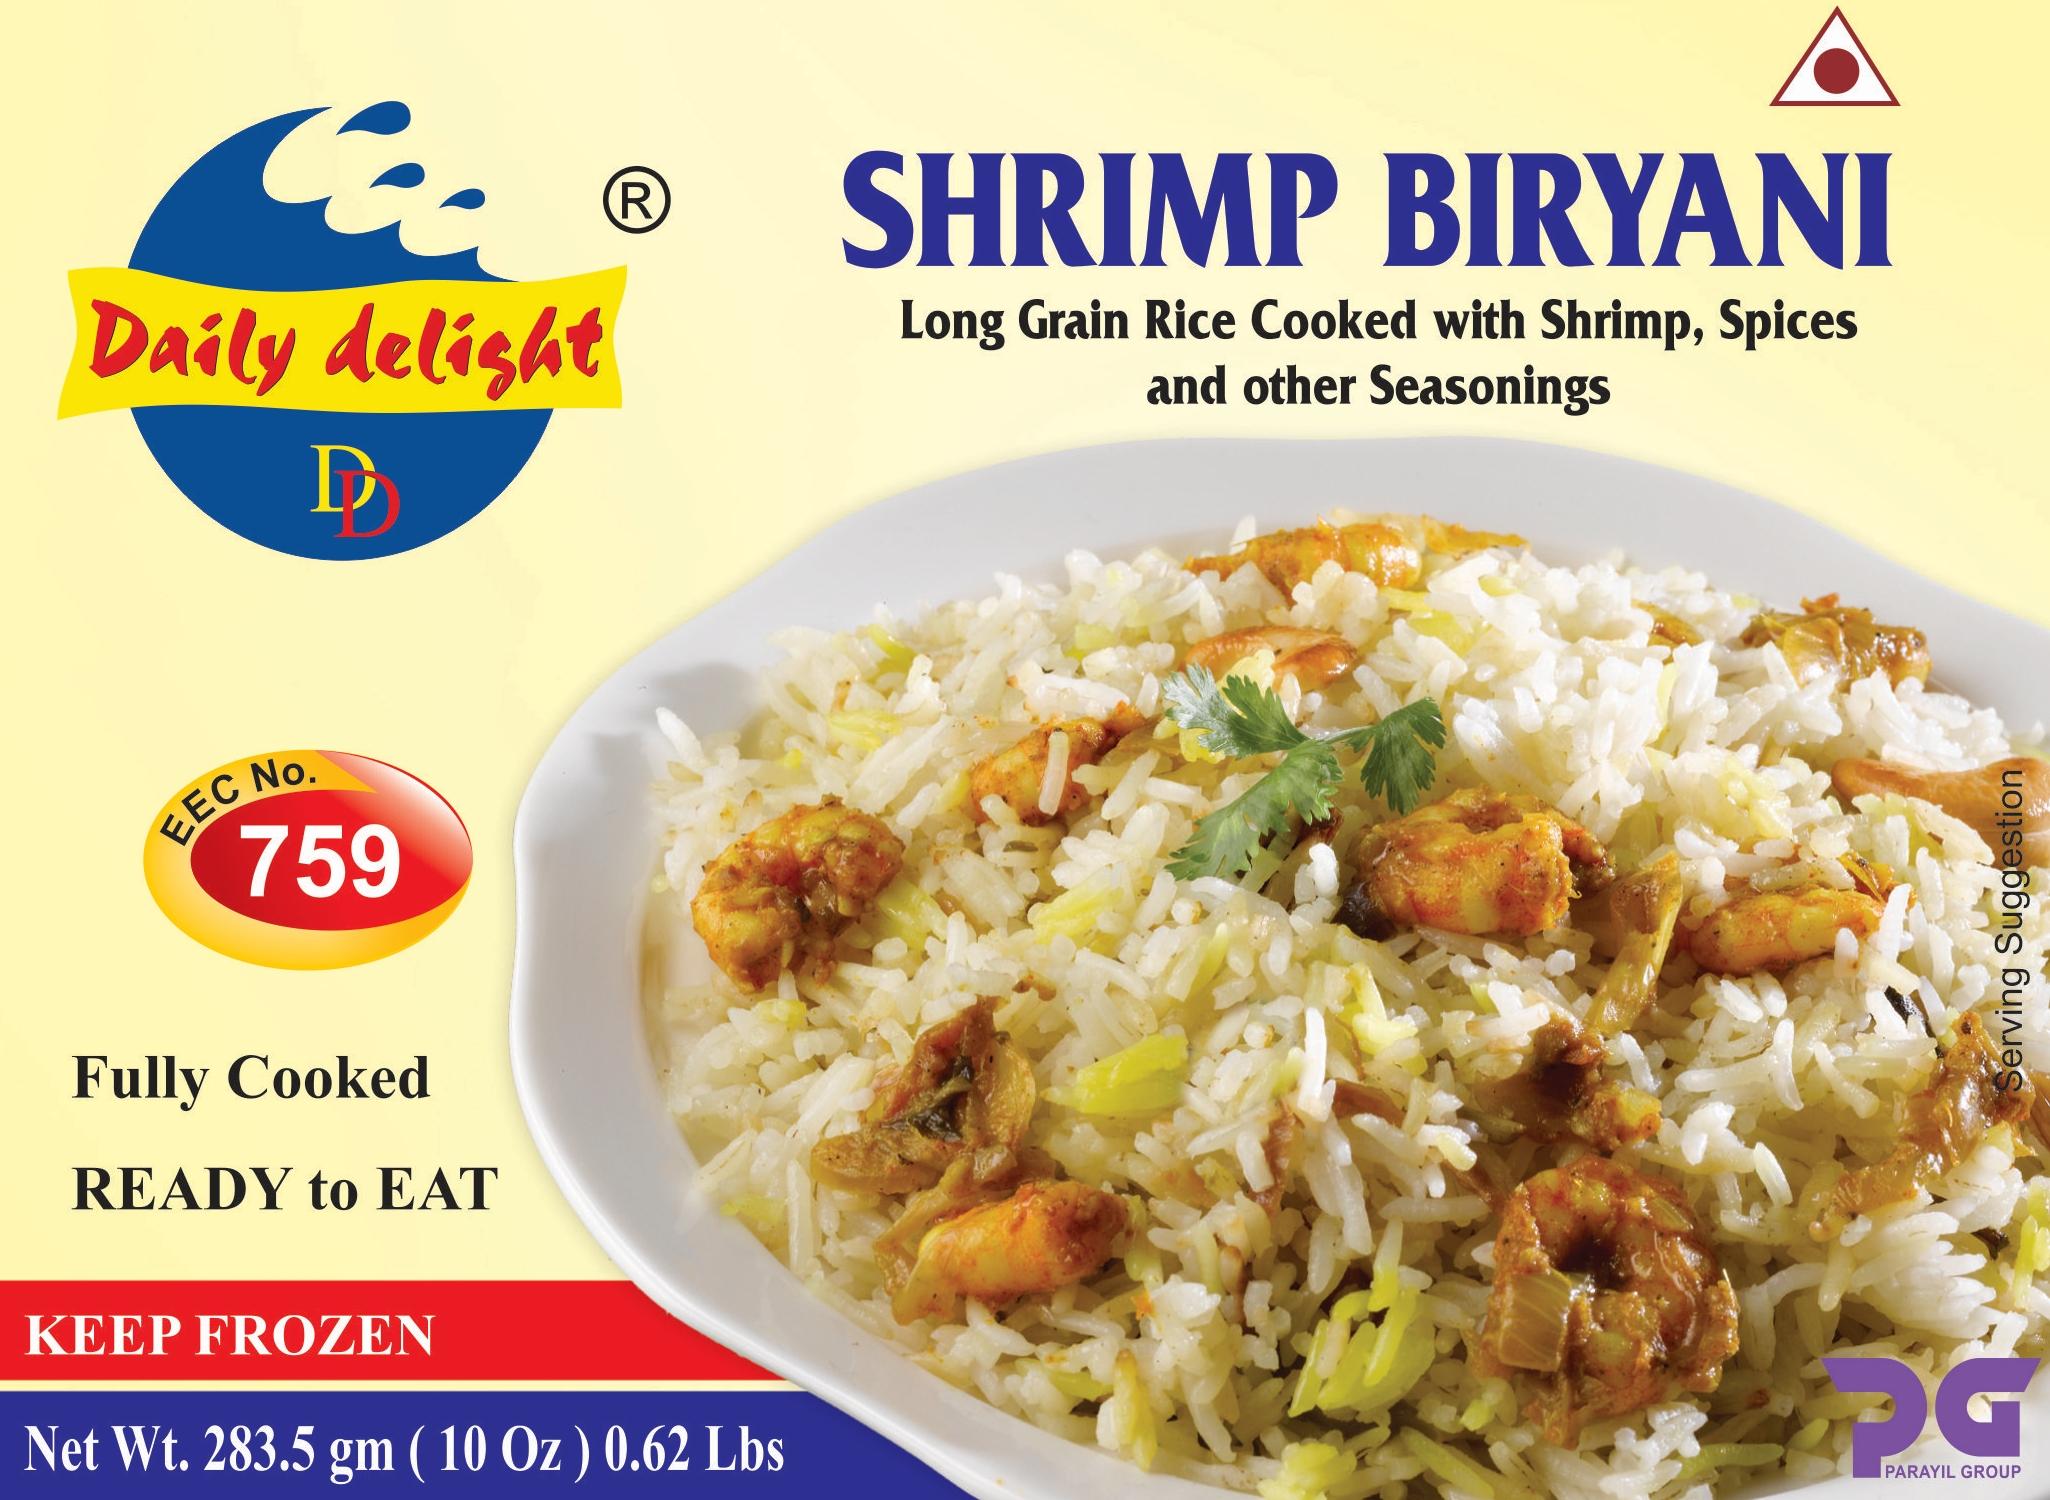 Daily Delight Shrimp Biryani